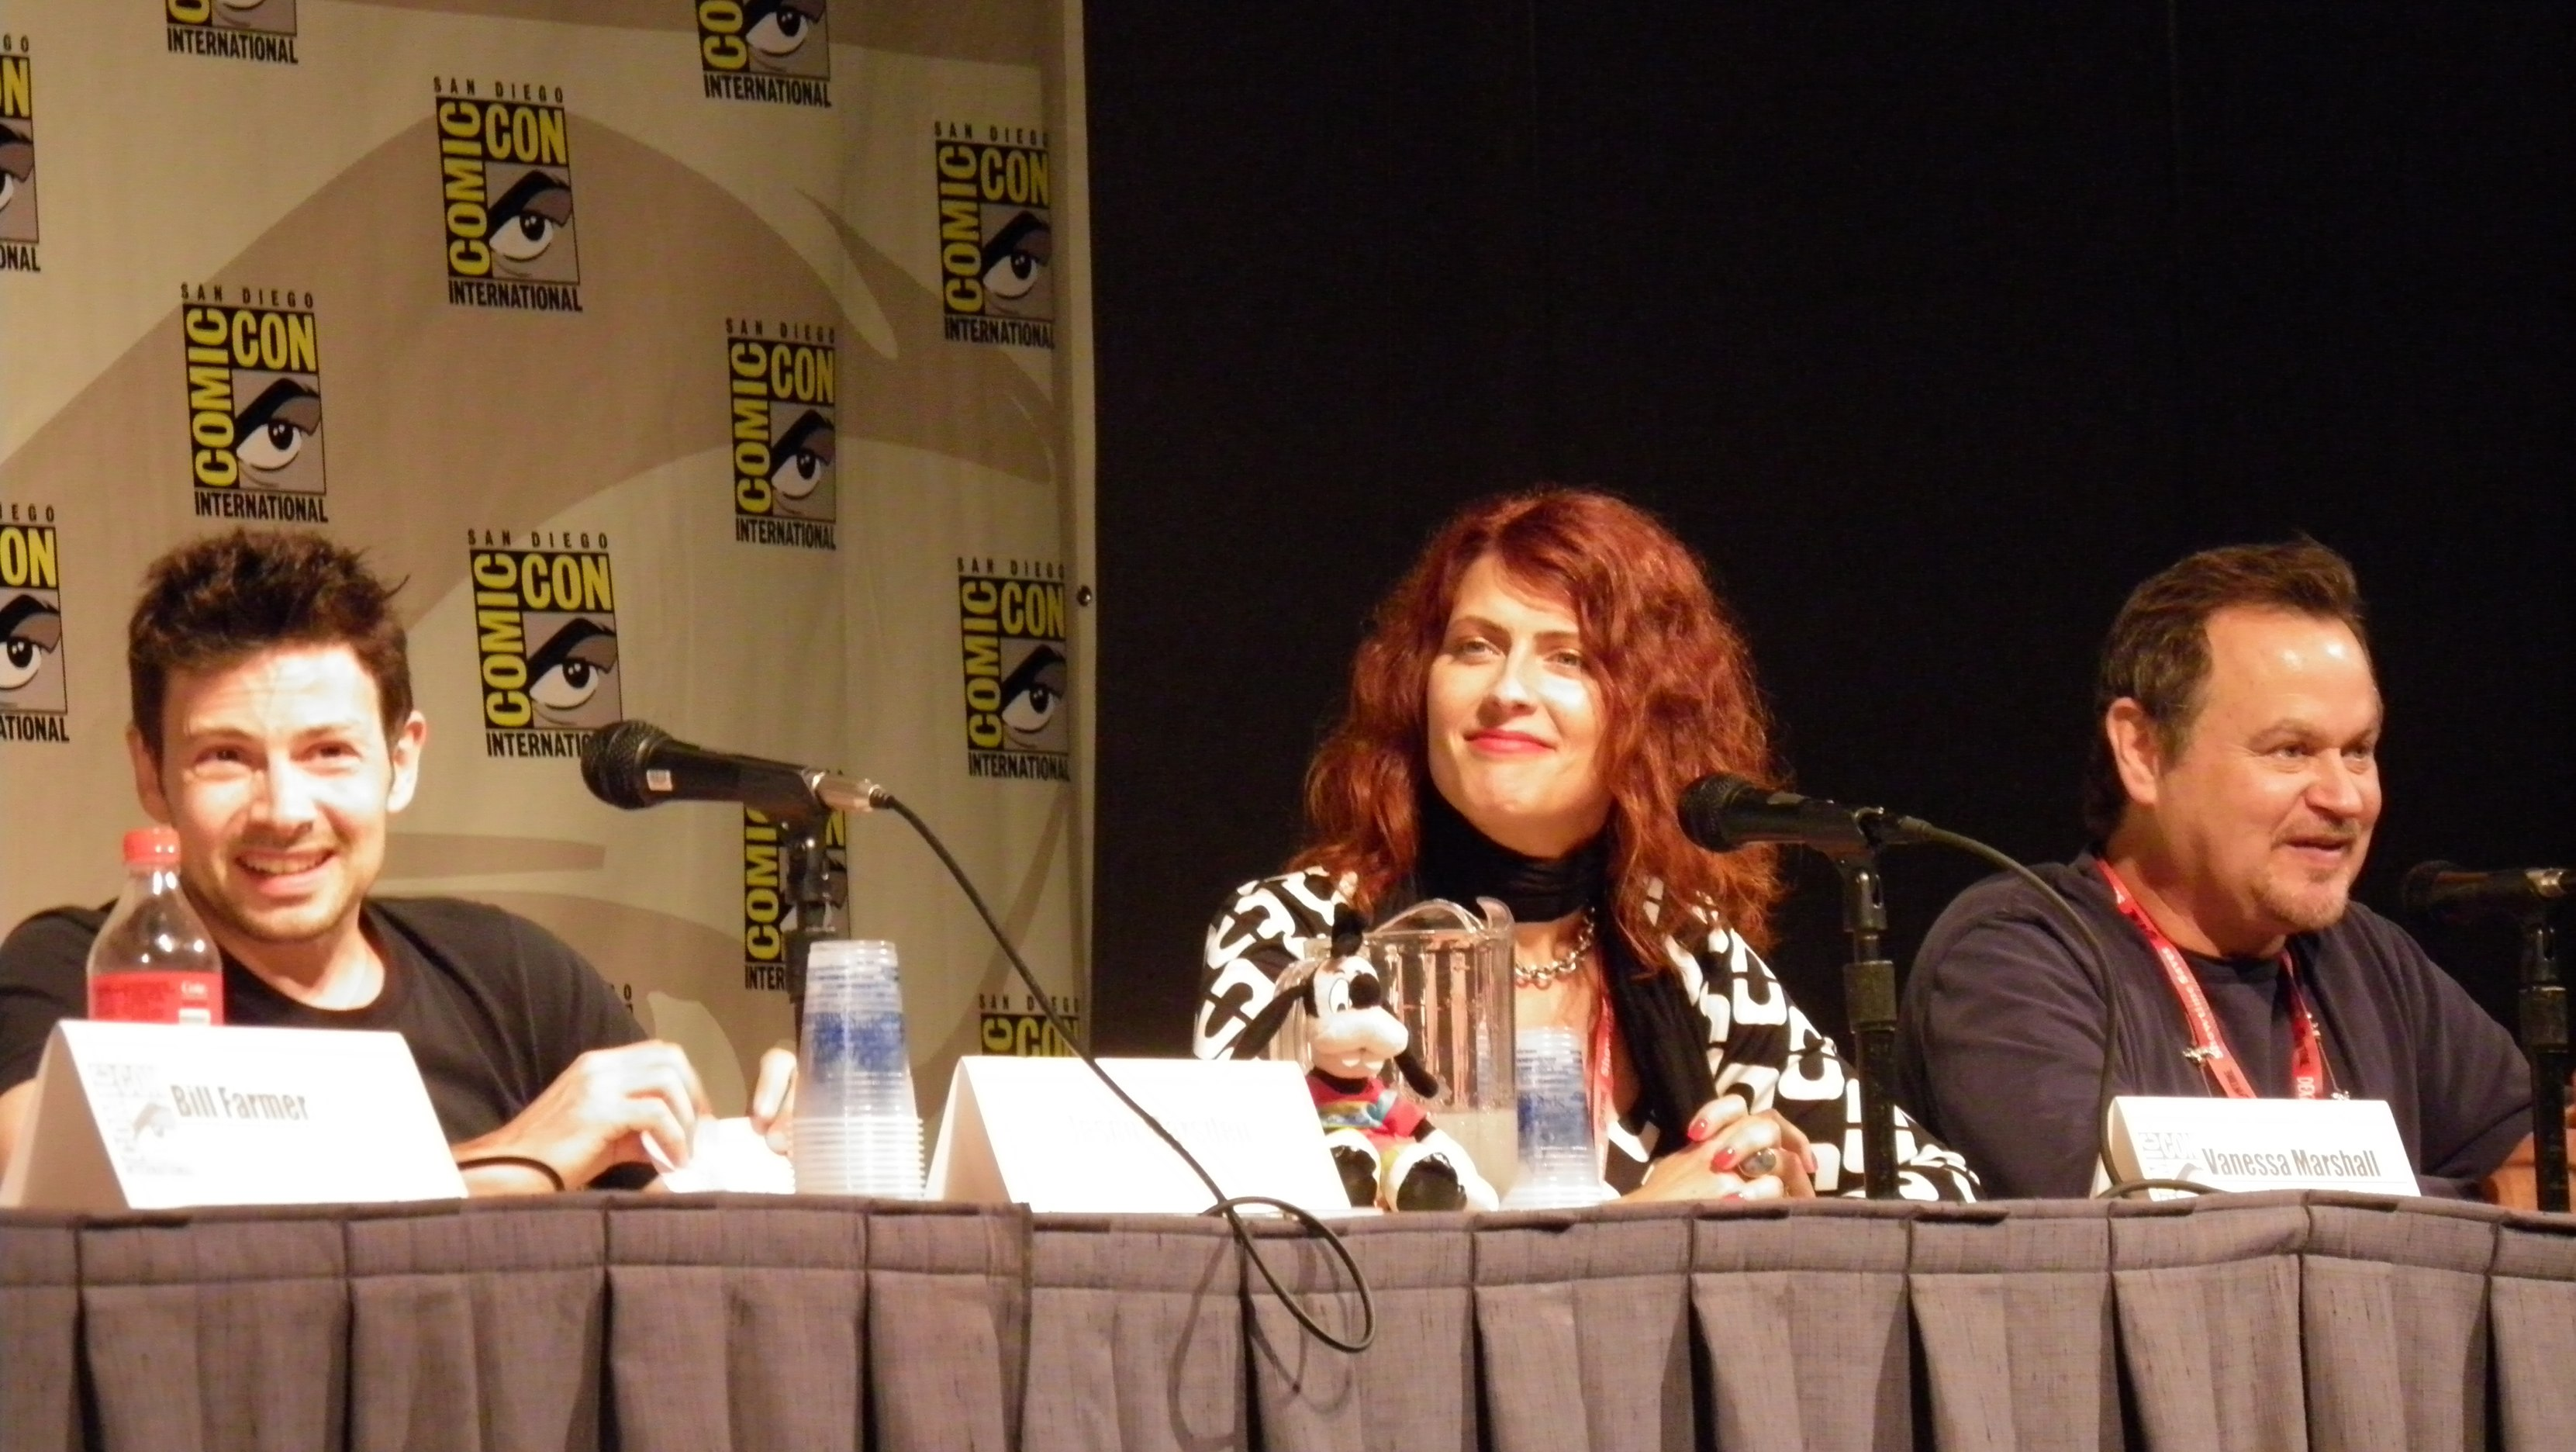 File:Jason Marsden, Vanessa Marshall, and Gregg Berger at Cartoon Voices II Panel.jpg